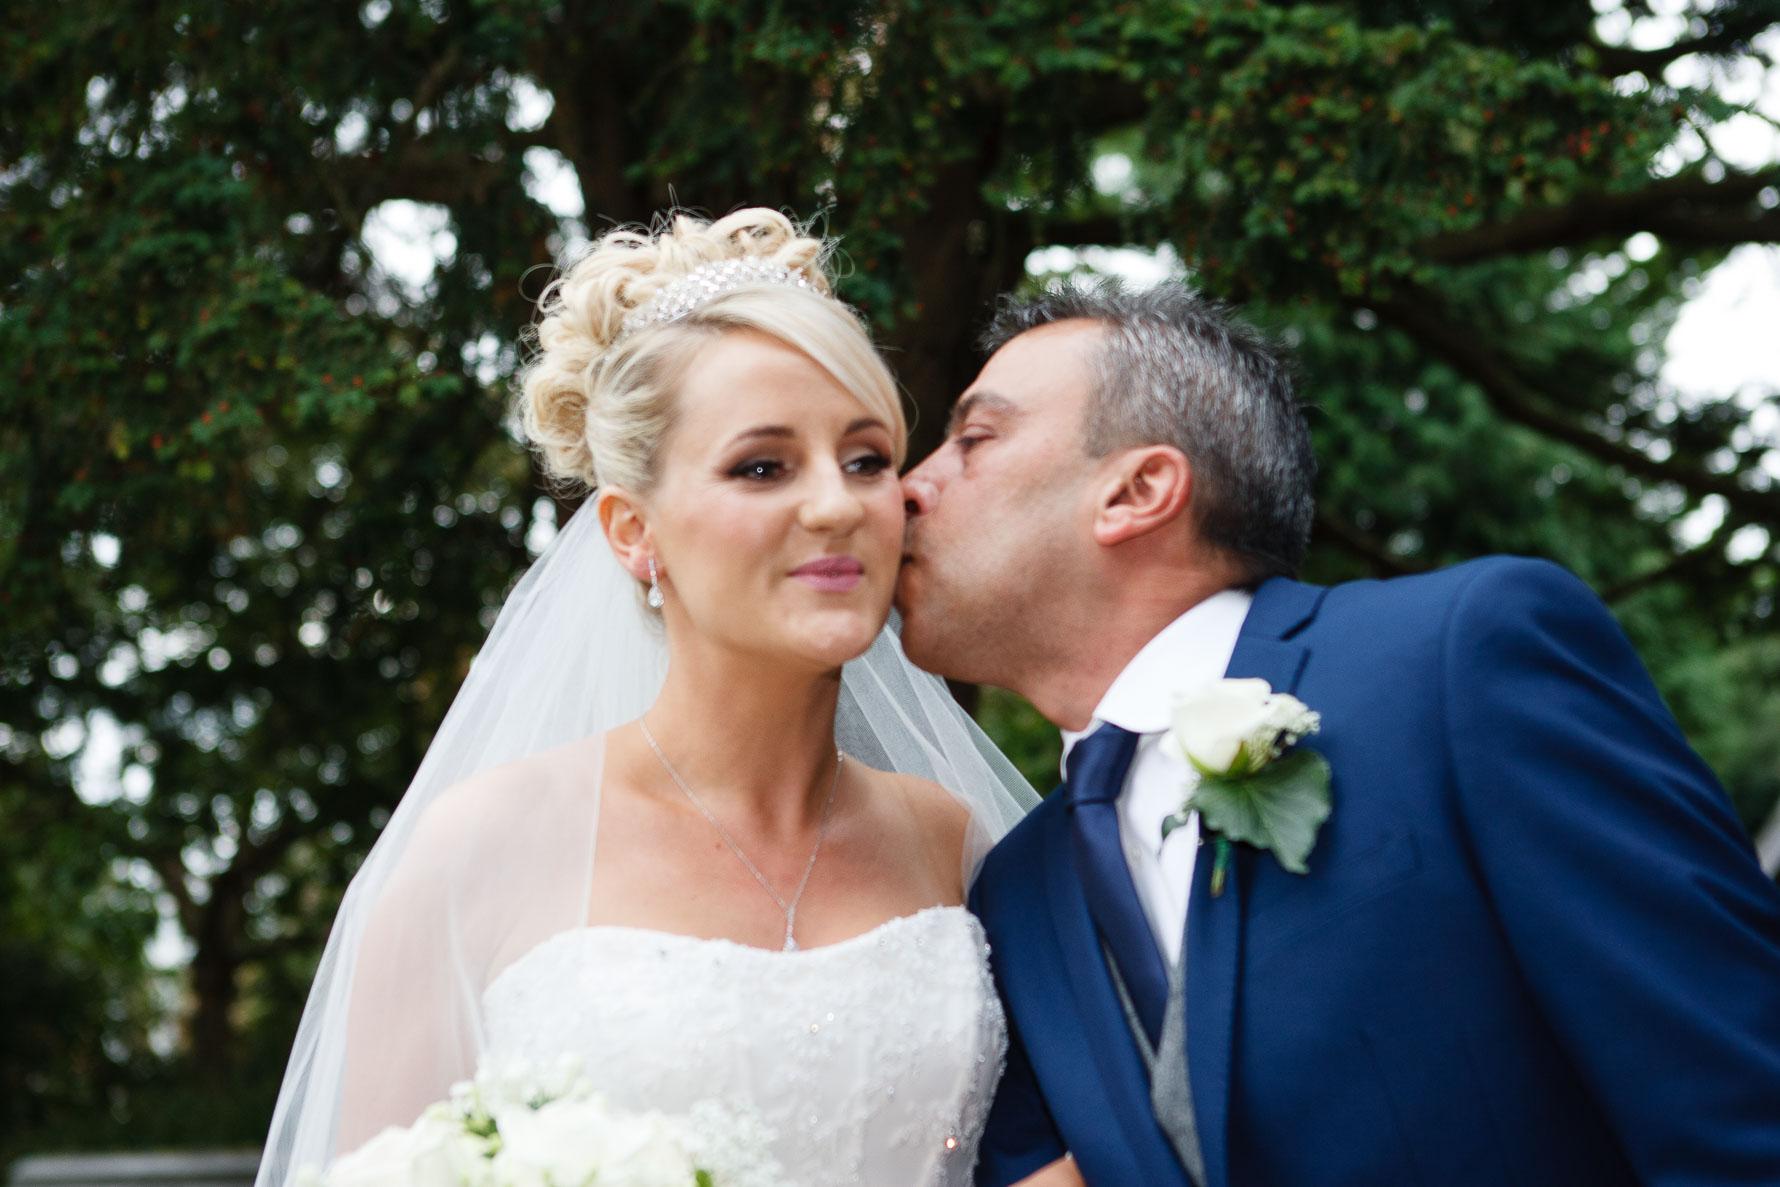 Canterbury Cathedral Lodge Wedding21-20141004 0397